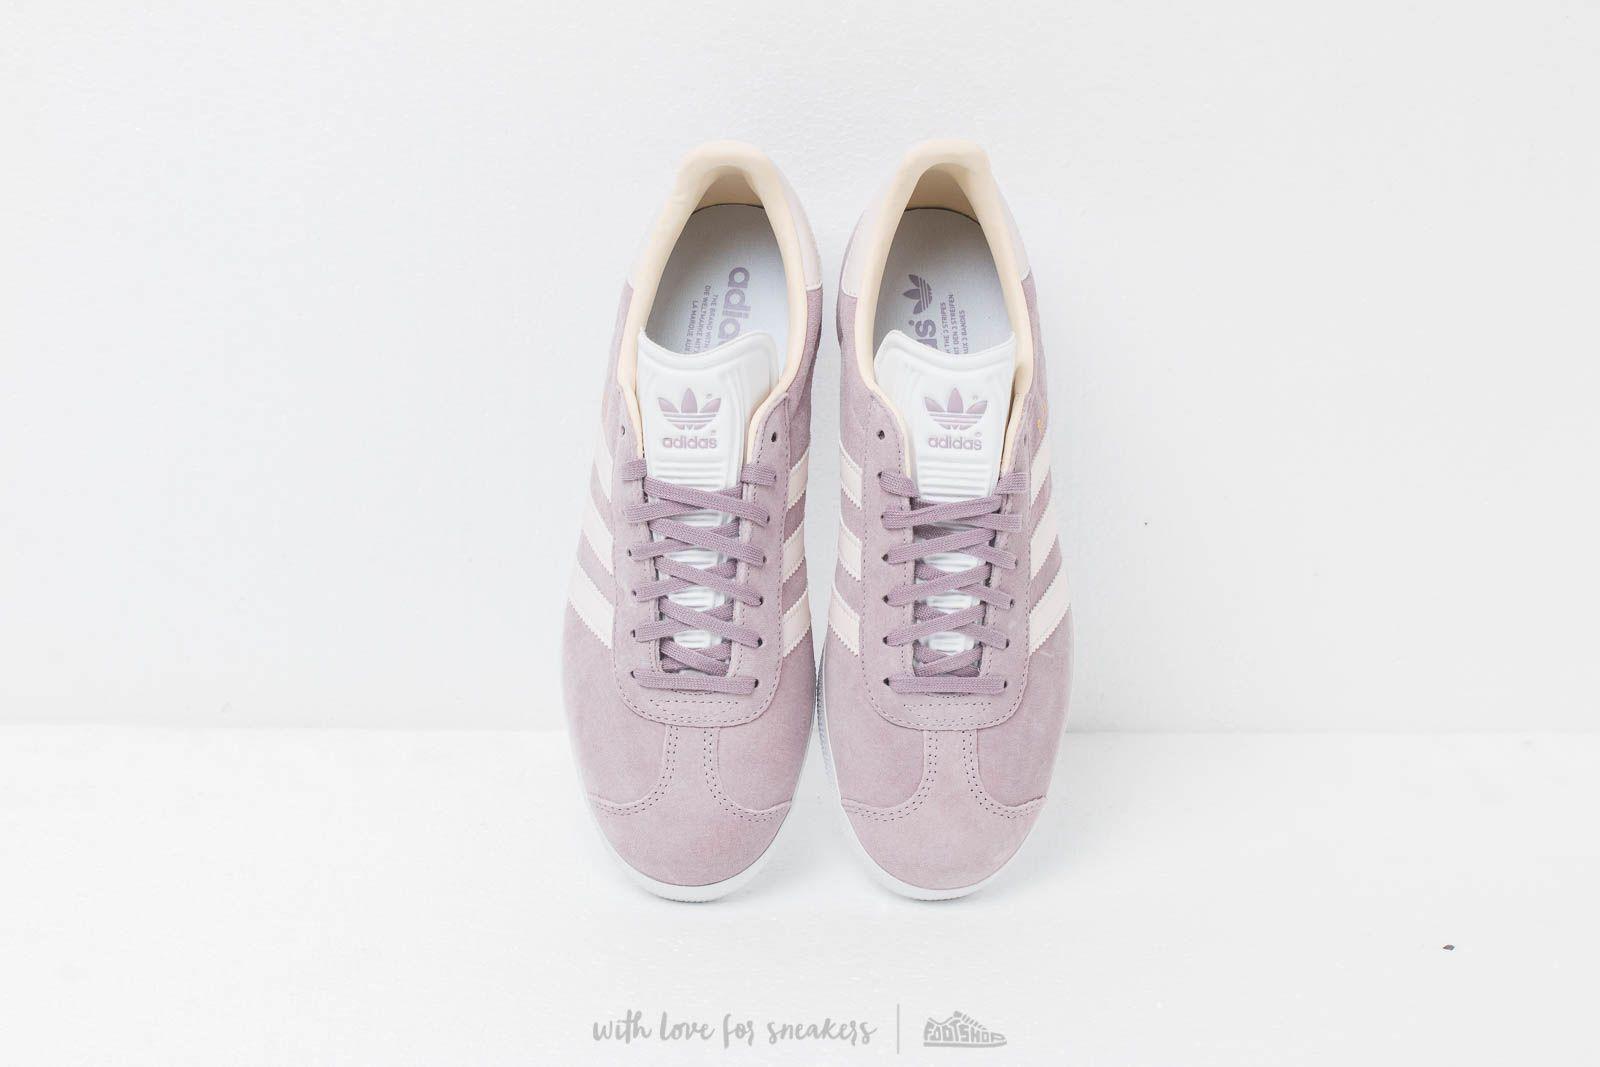 7dc6b58e9dd adidas Gazelle W Sofvis/ Orctin/ Ecrtin at a great price 88 € buy at